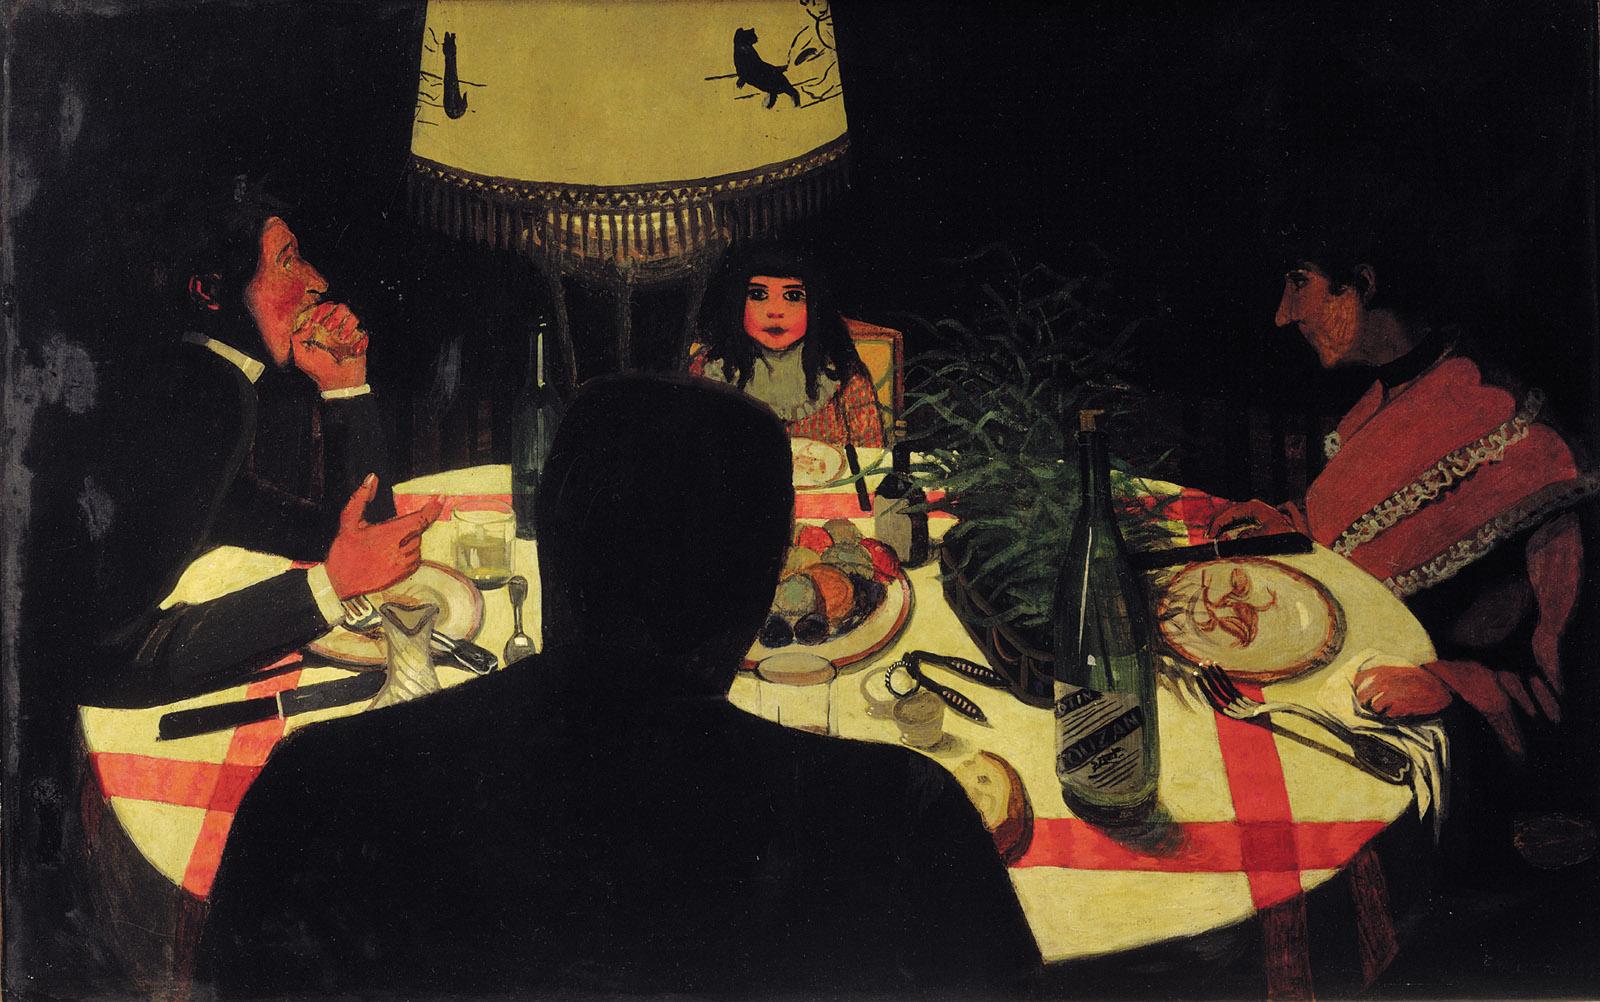 Félix Vallotton: Dinner by Lamplight, 22 1/2 x 35 1/4 inches, 1899